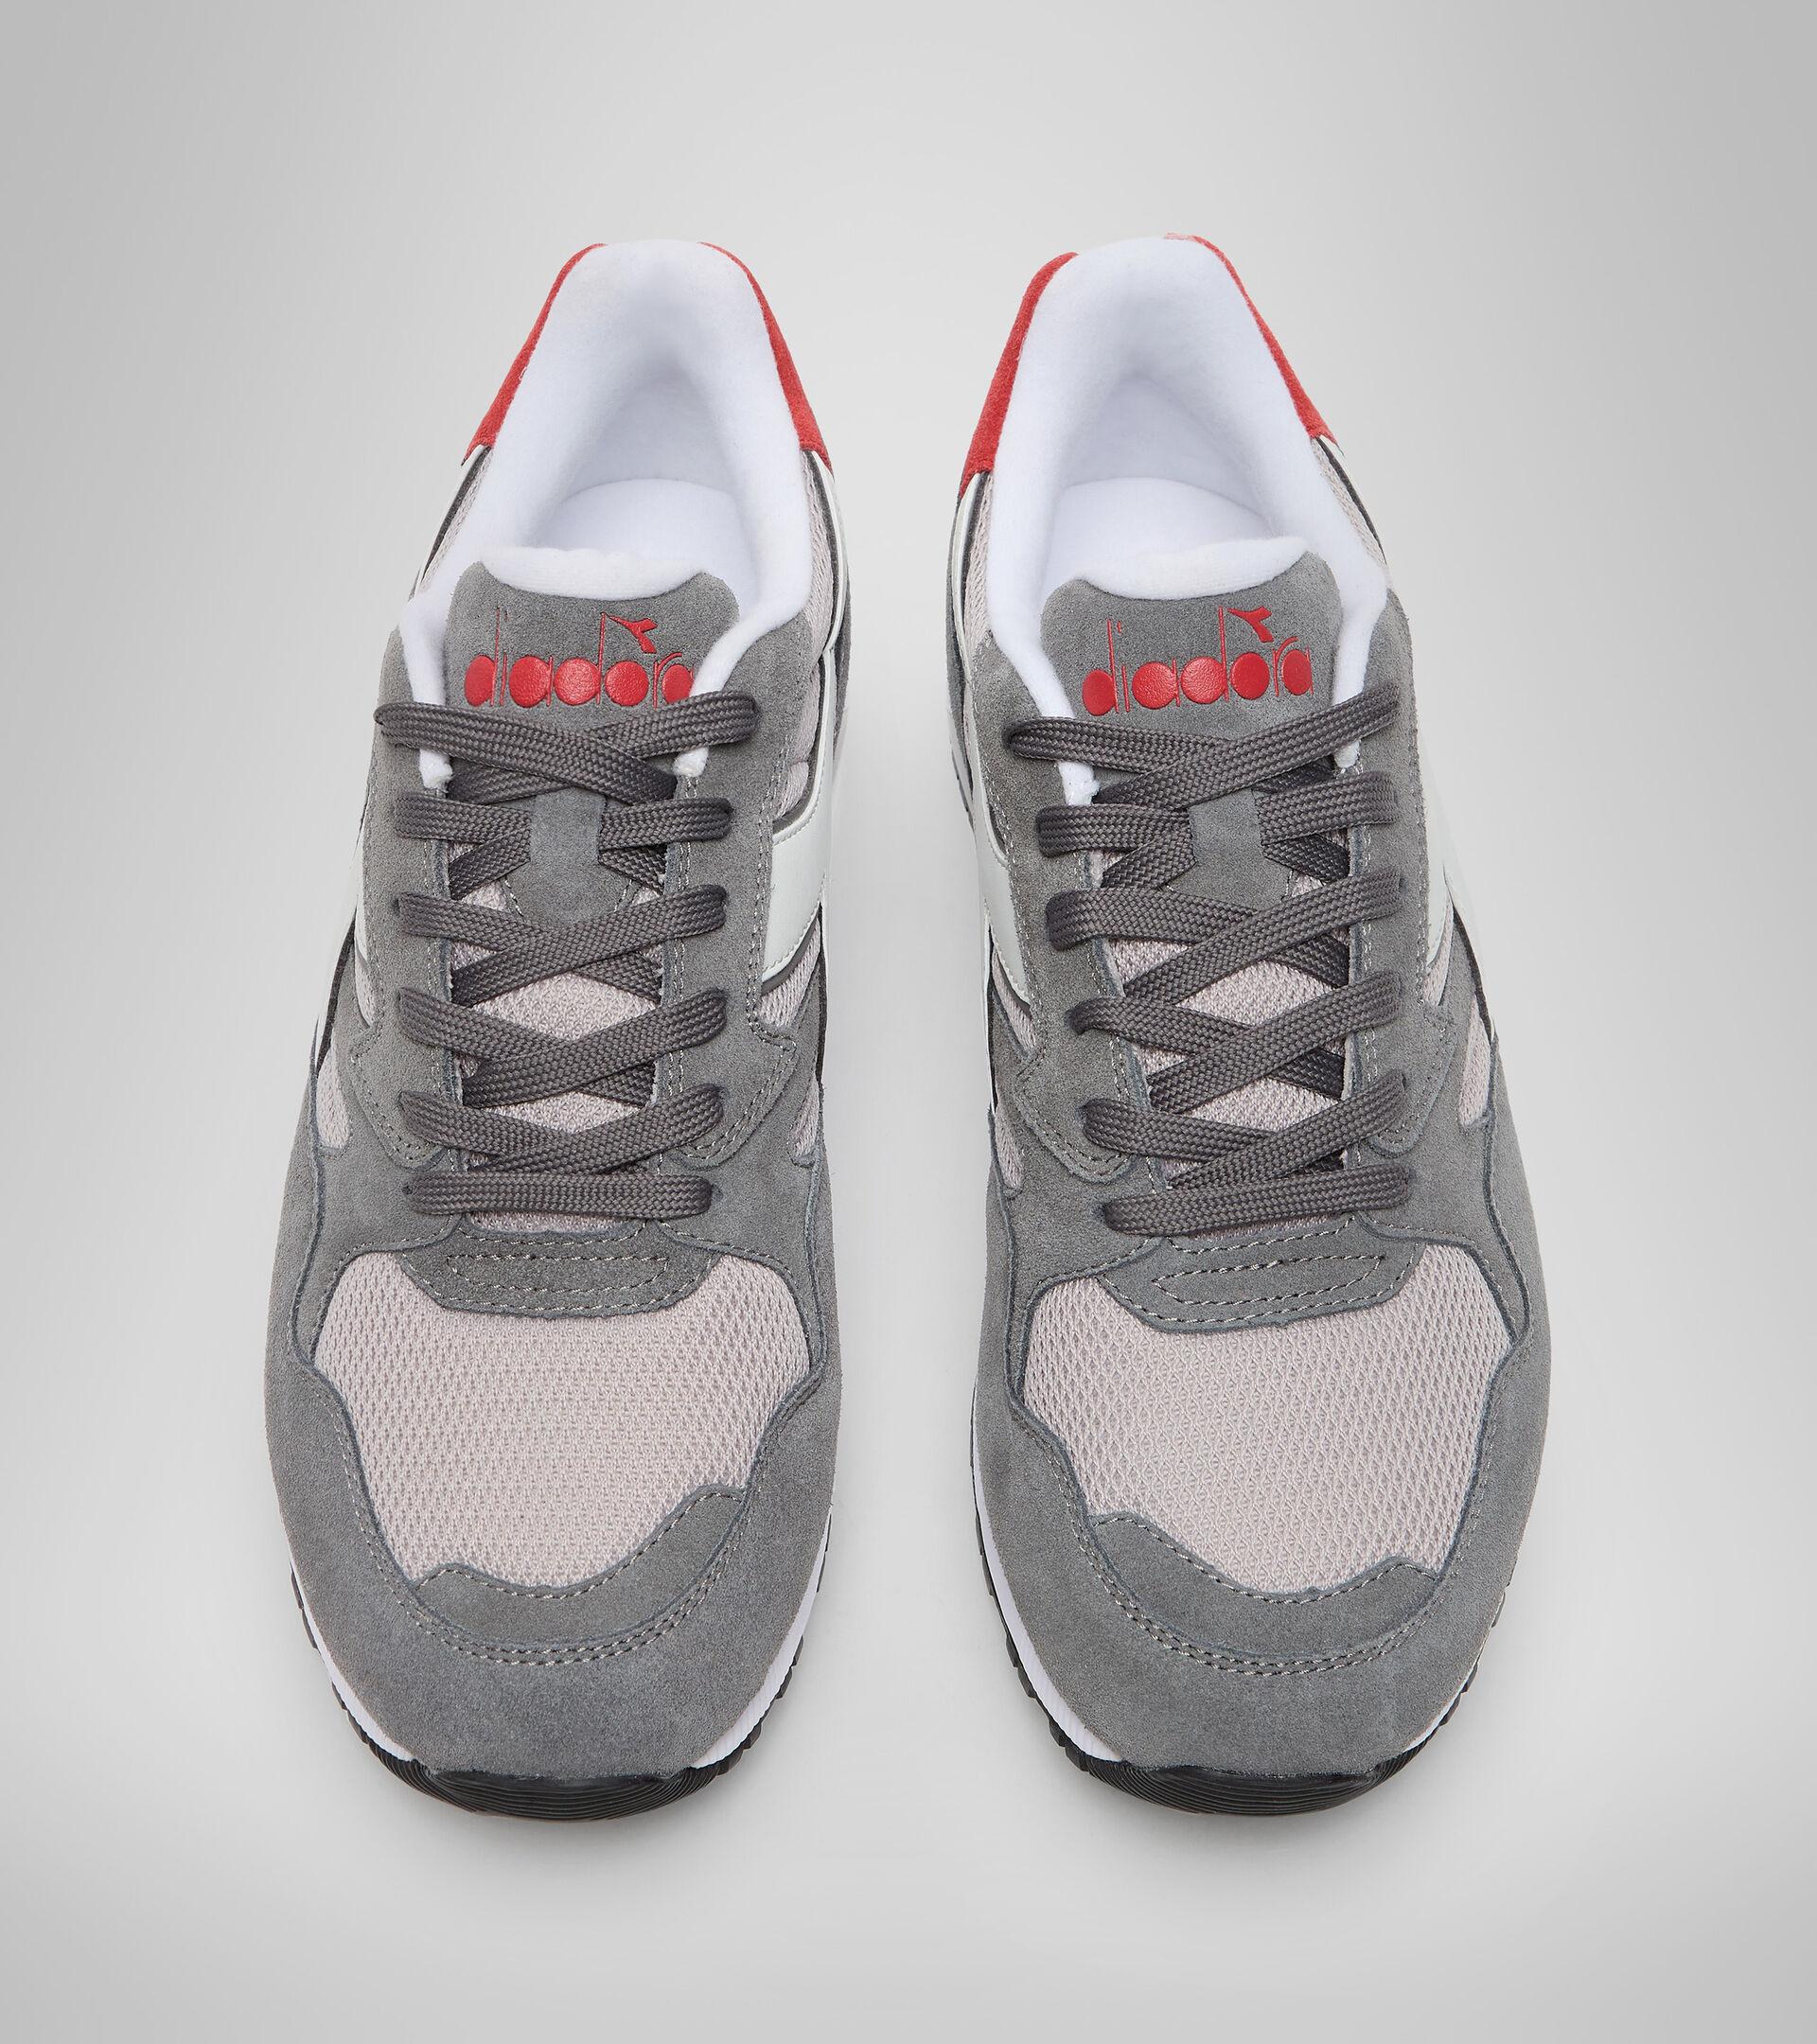 Footwear Sportswear UNISEX N902 S GRIS CARBON Diadora